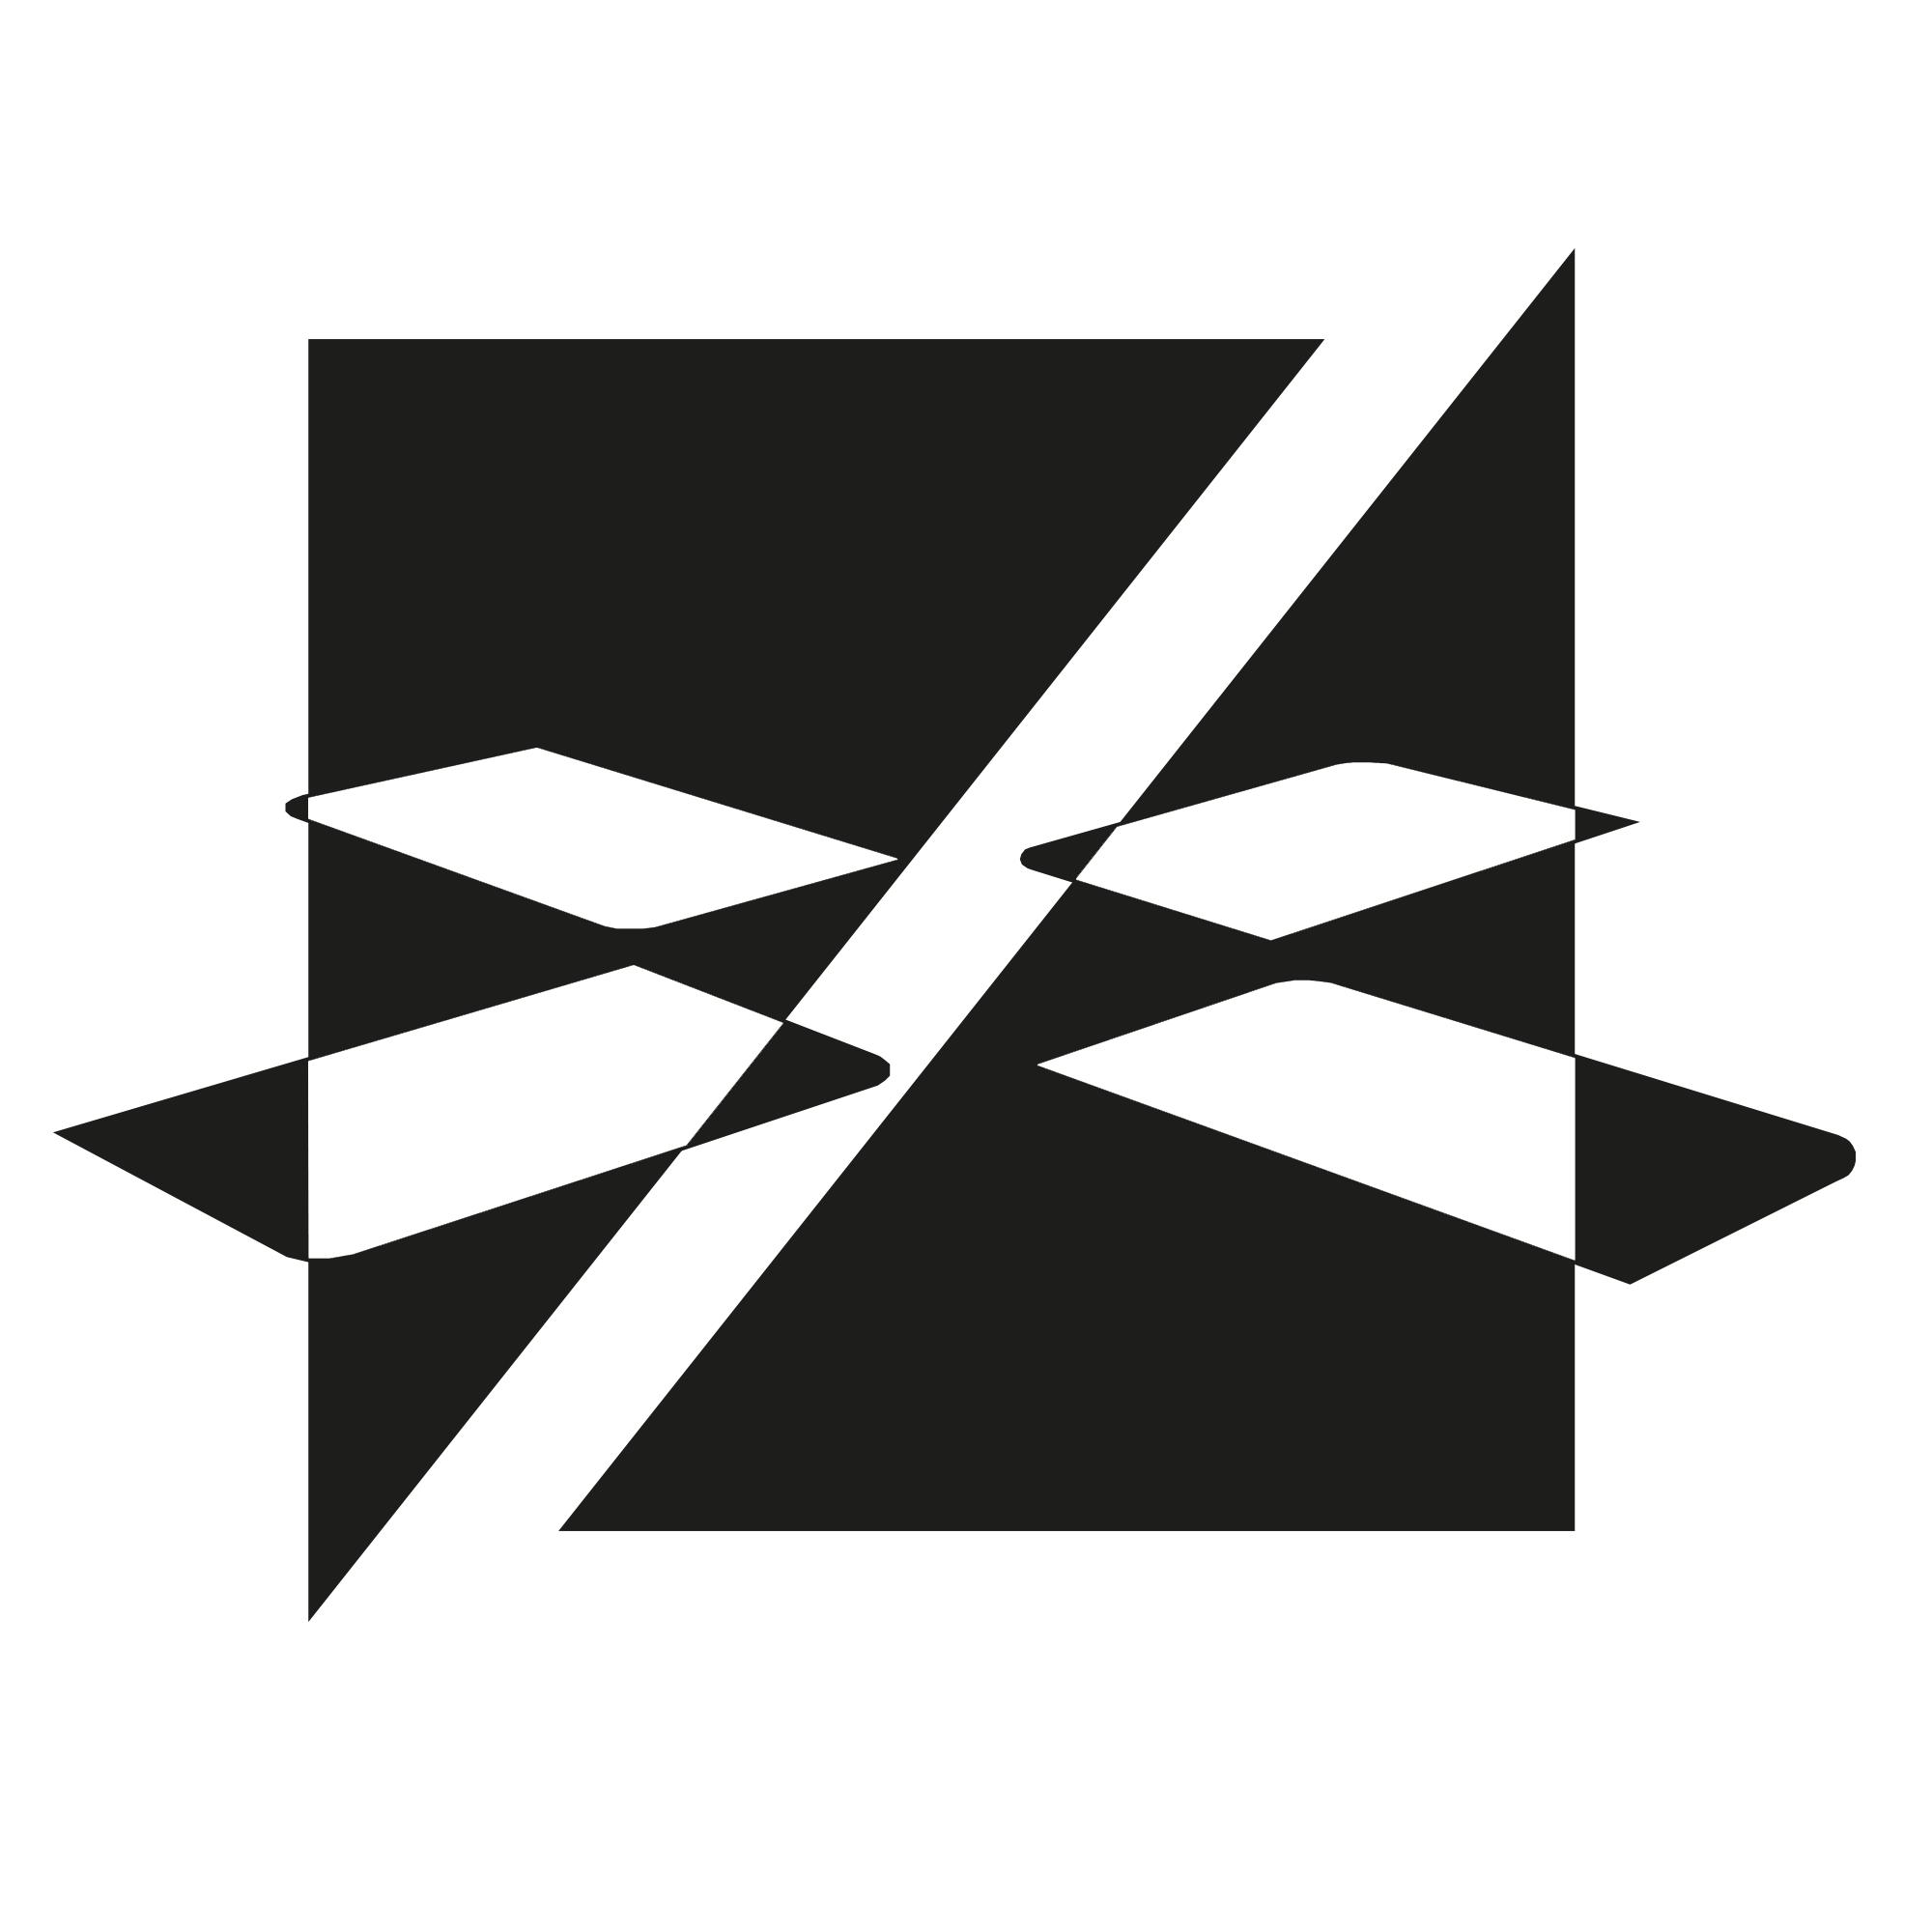 https://jpe-dallages.com/wp-content/uploads/2021/04/80548014_102466724616412_5177807367110131712_n.png